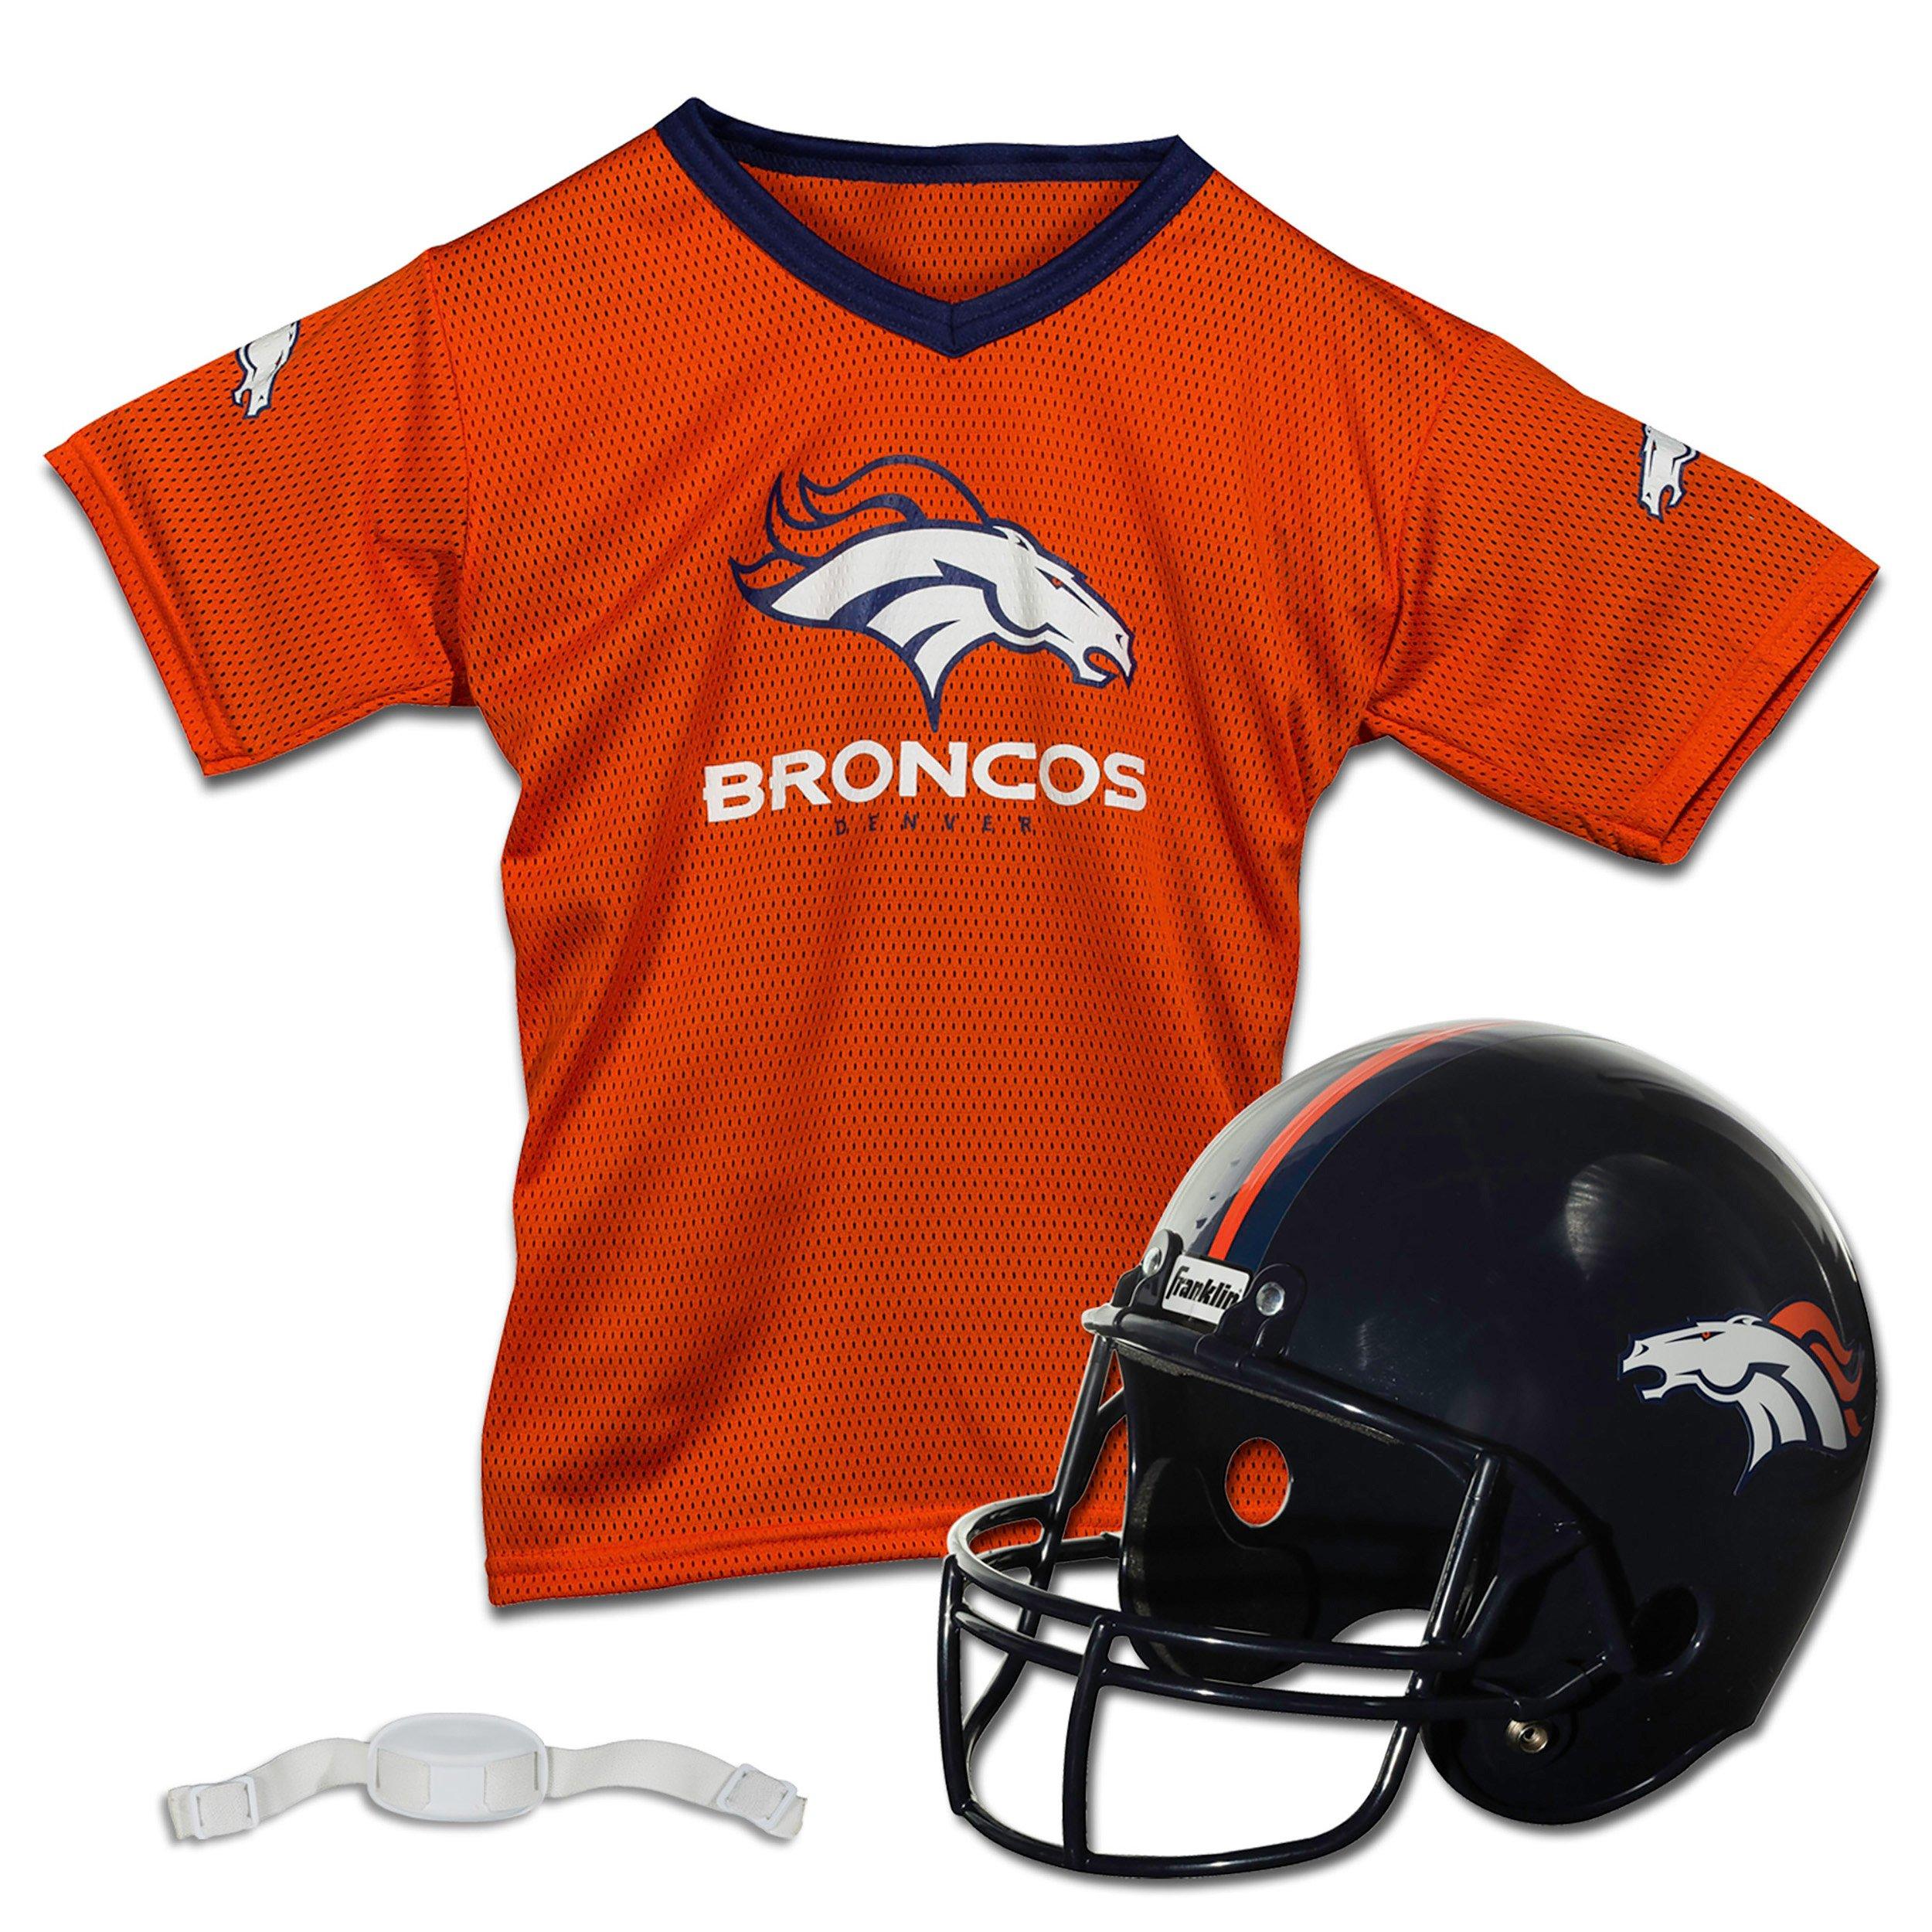 Franklin Sports NFL Denver Broncos Replica Youth Helmet and Jersey Set by Franklin Sports